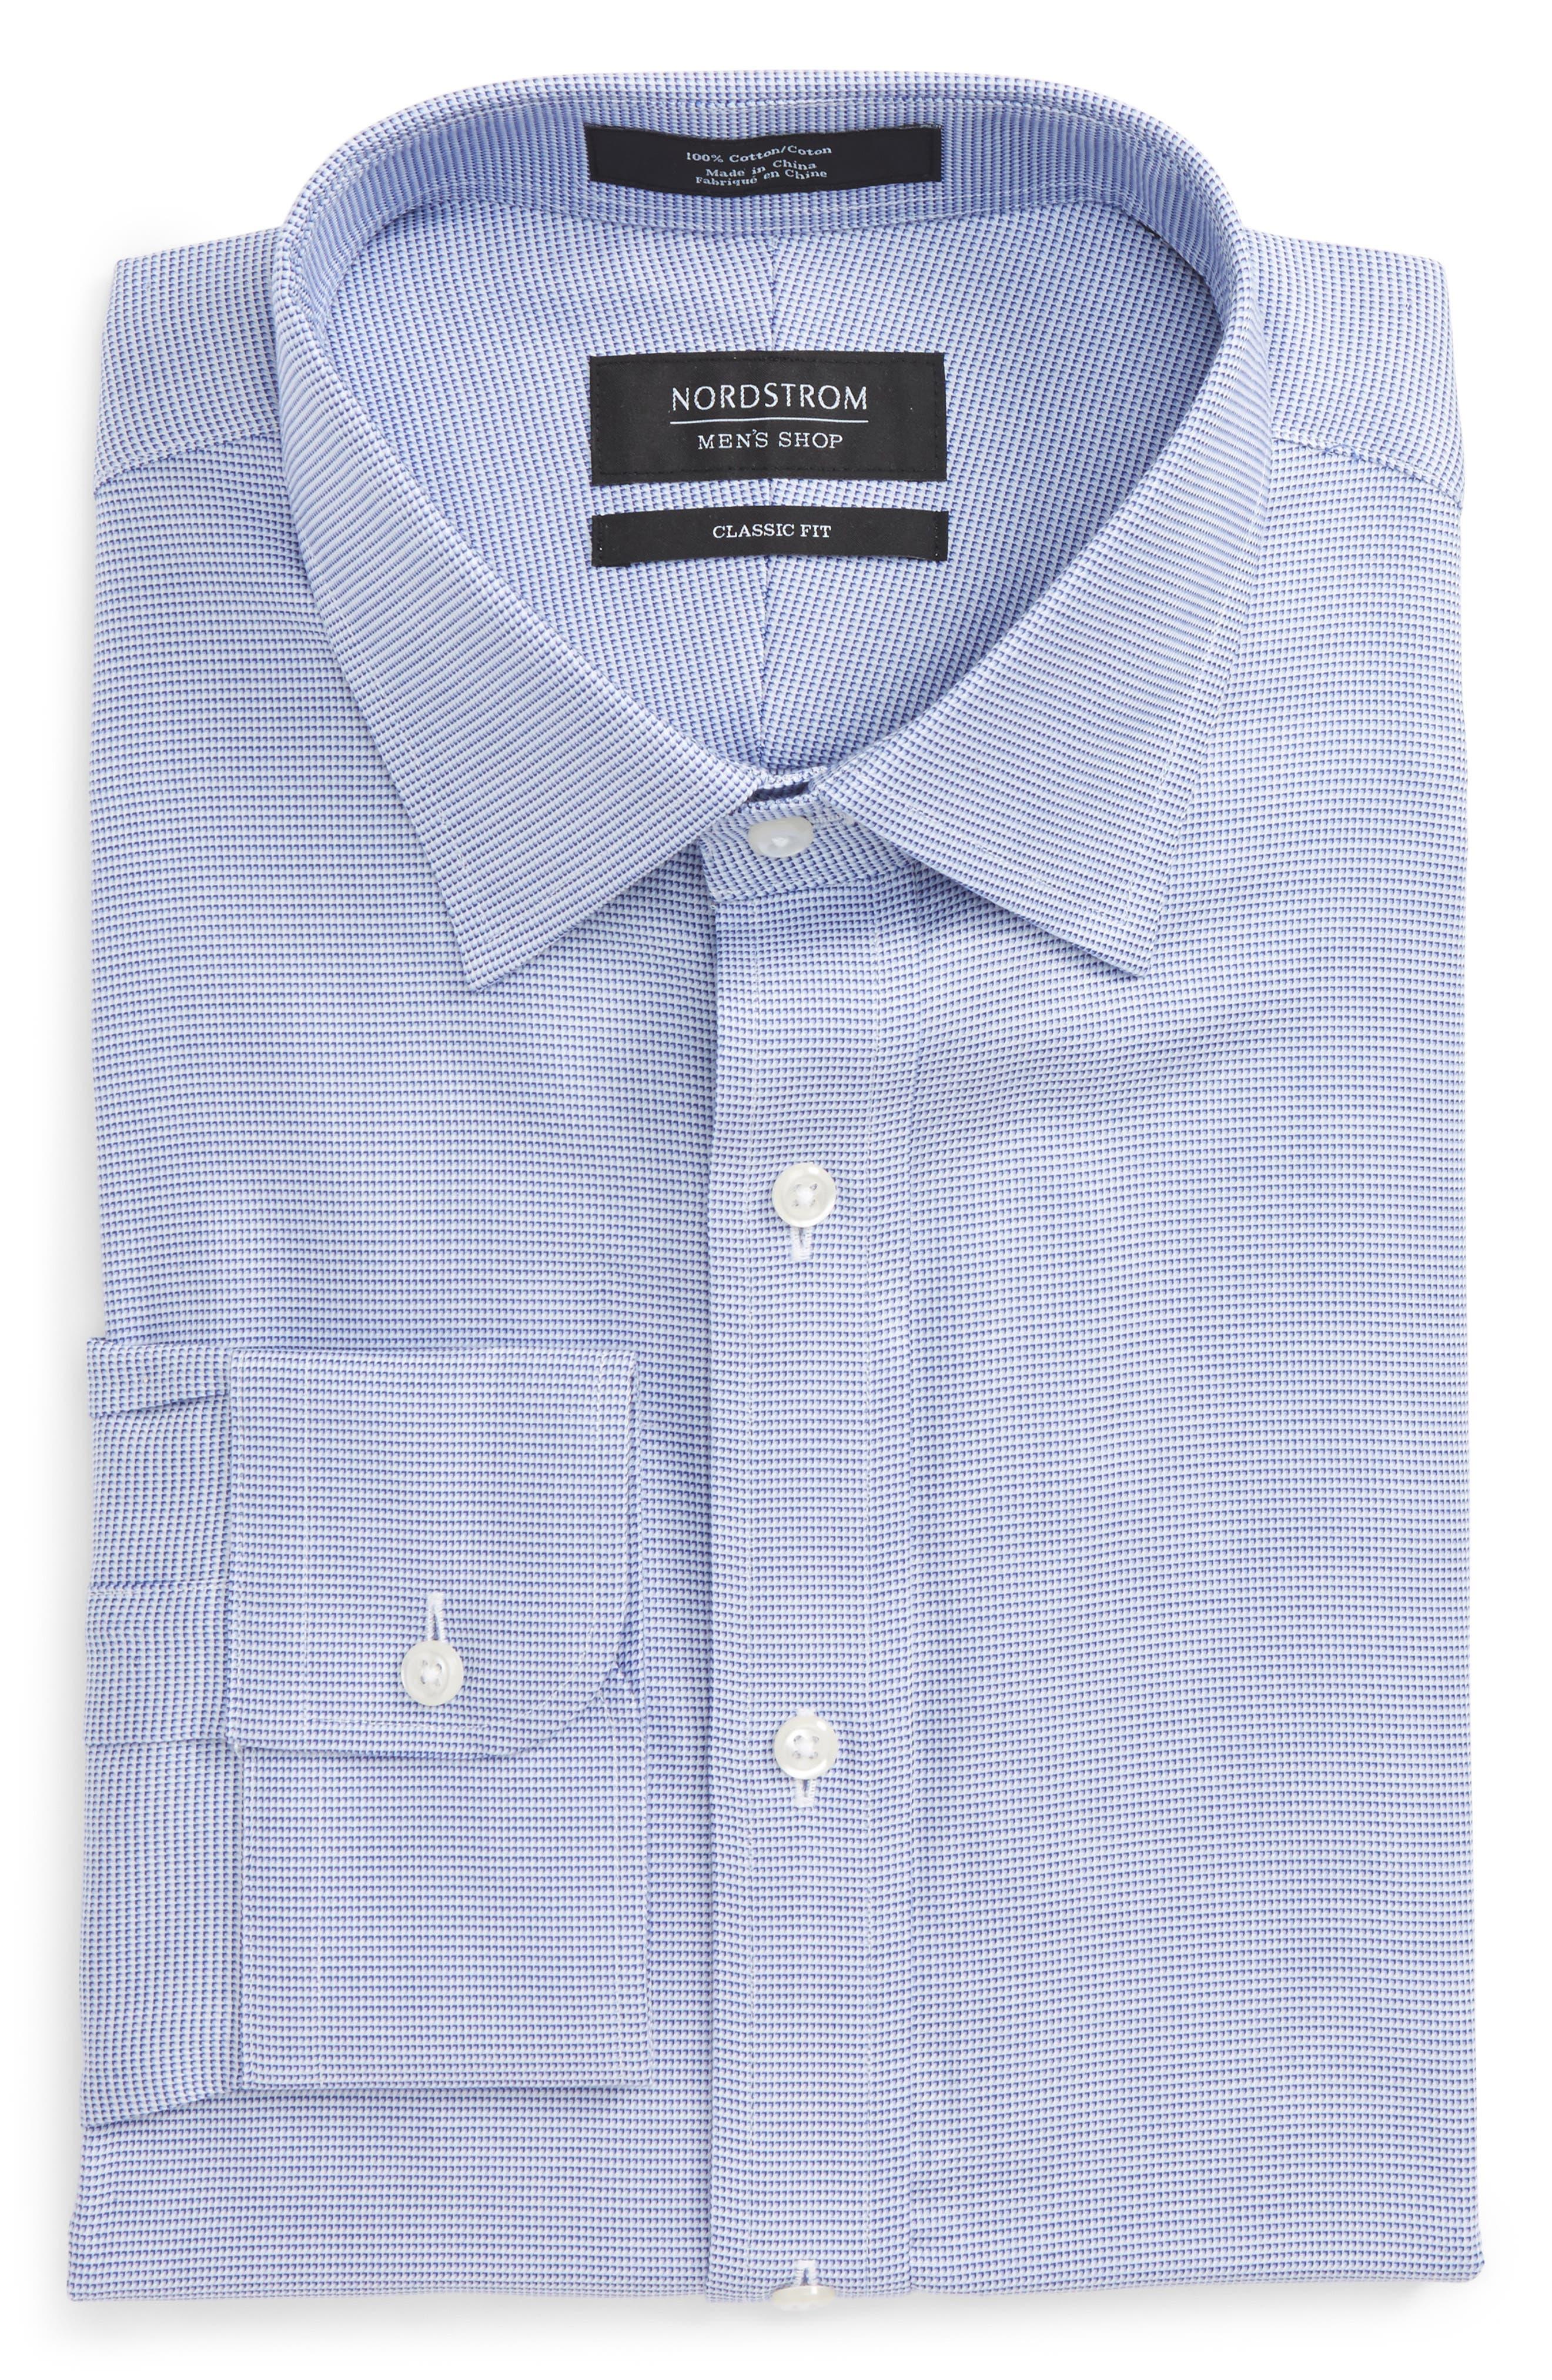 Classic Fit Solid Dress Shirt,                         Main,                         color, Blue Marine